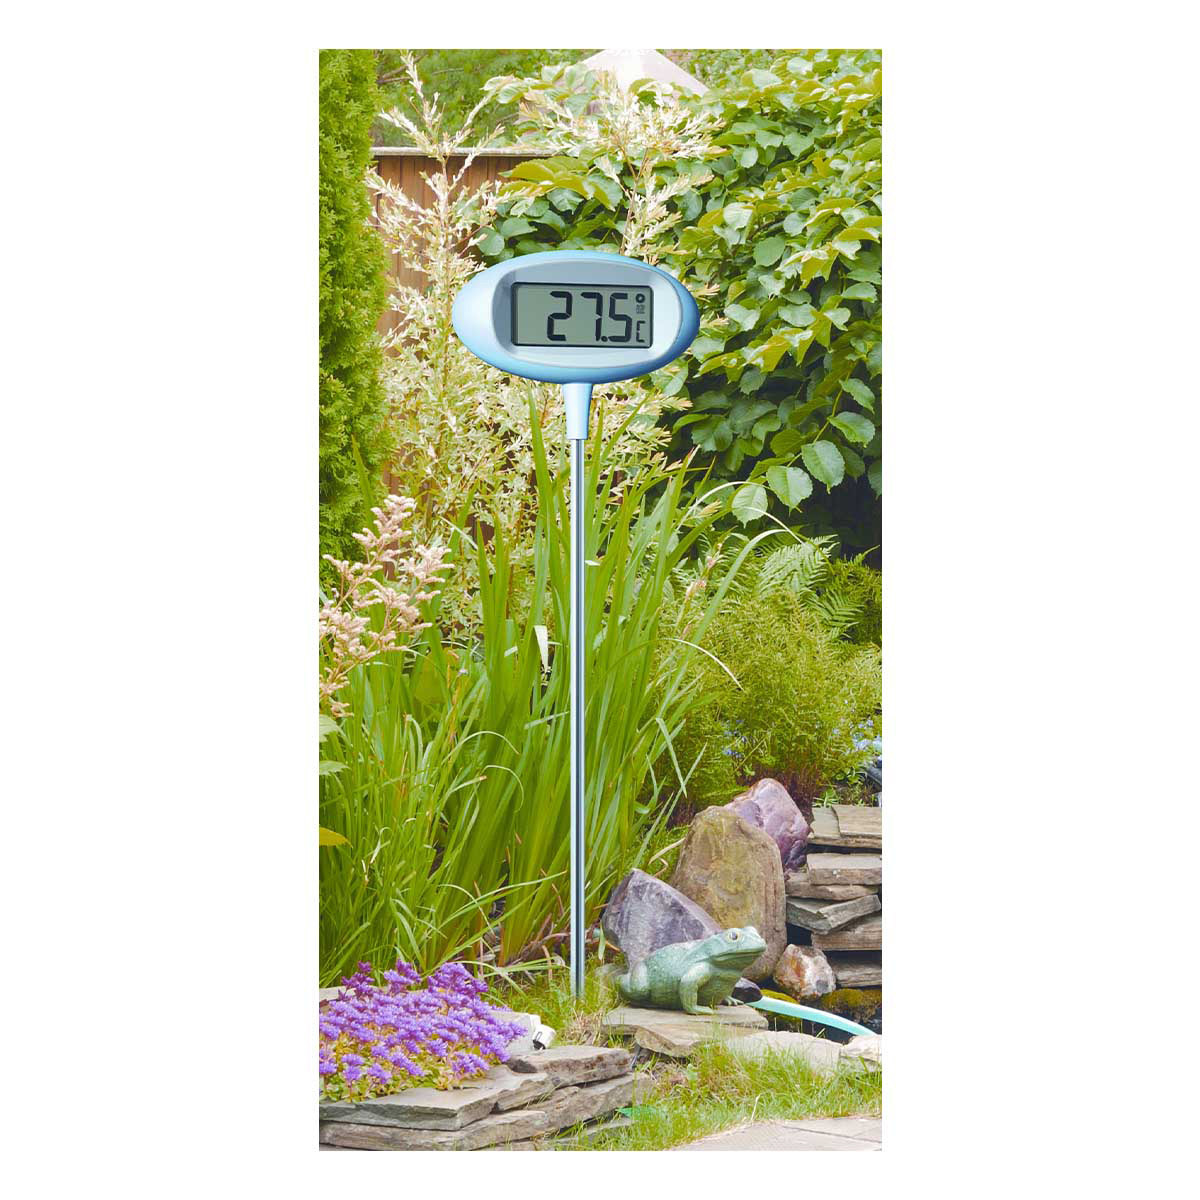 30-2024-06-digitales-desgin-gartenthermometer-orion-anwendung-1200x1200px.jpg